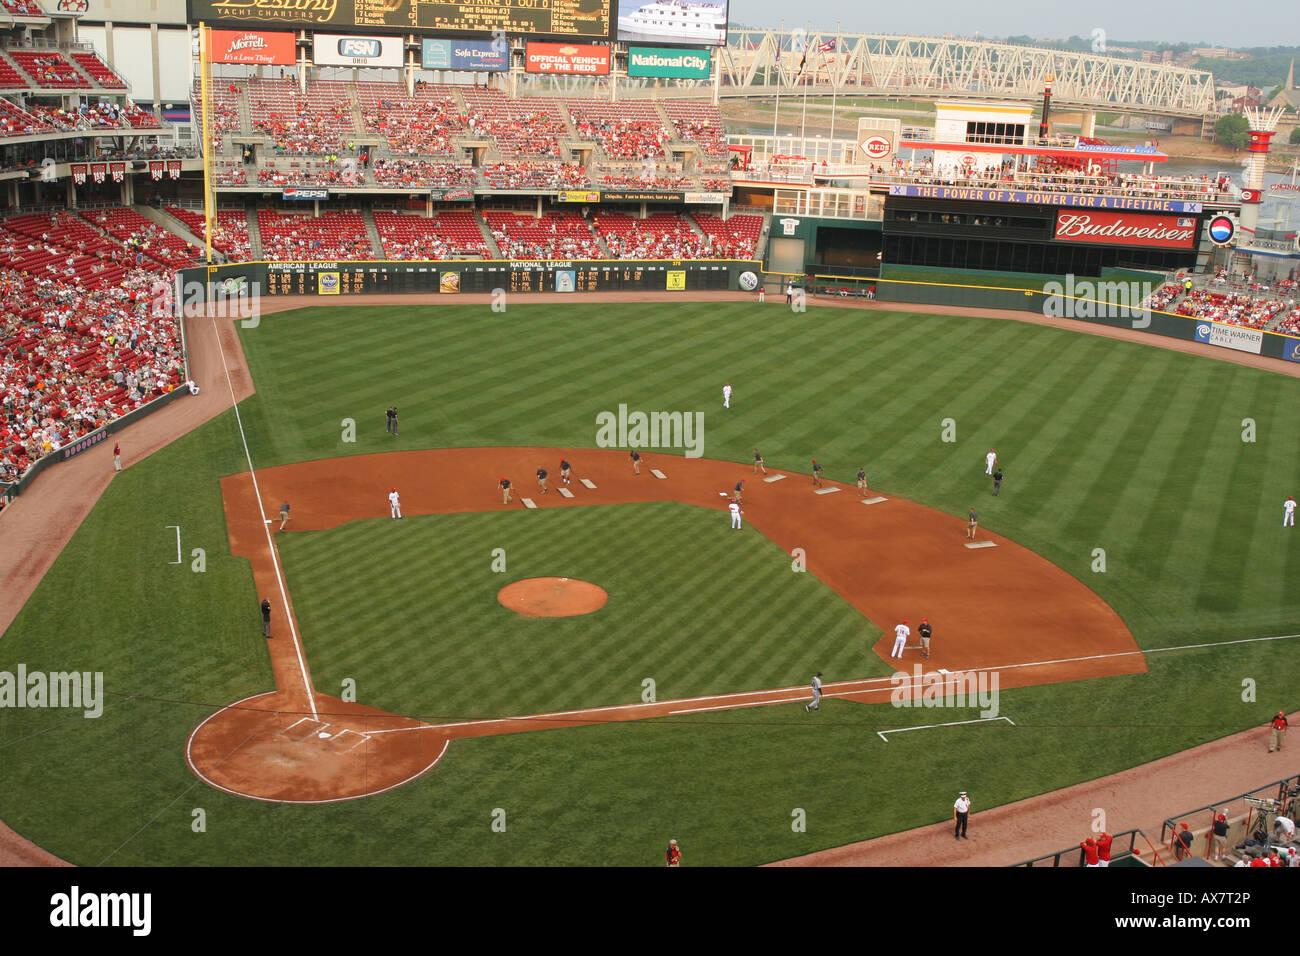 Great American Ball Park Cincinnati Ohio Cincinnati Reds baseball team home field Preparing the field for play - Stock Image